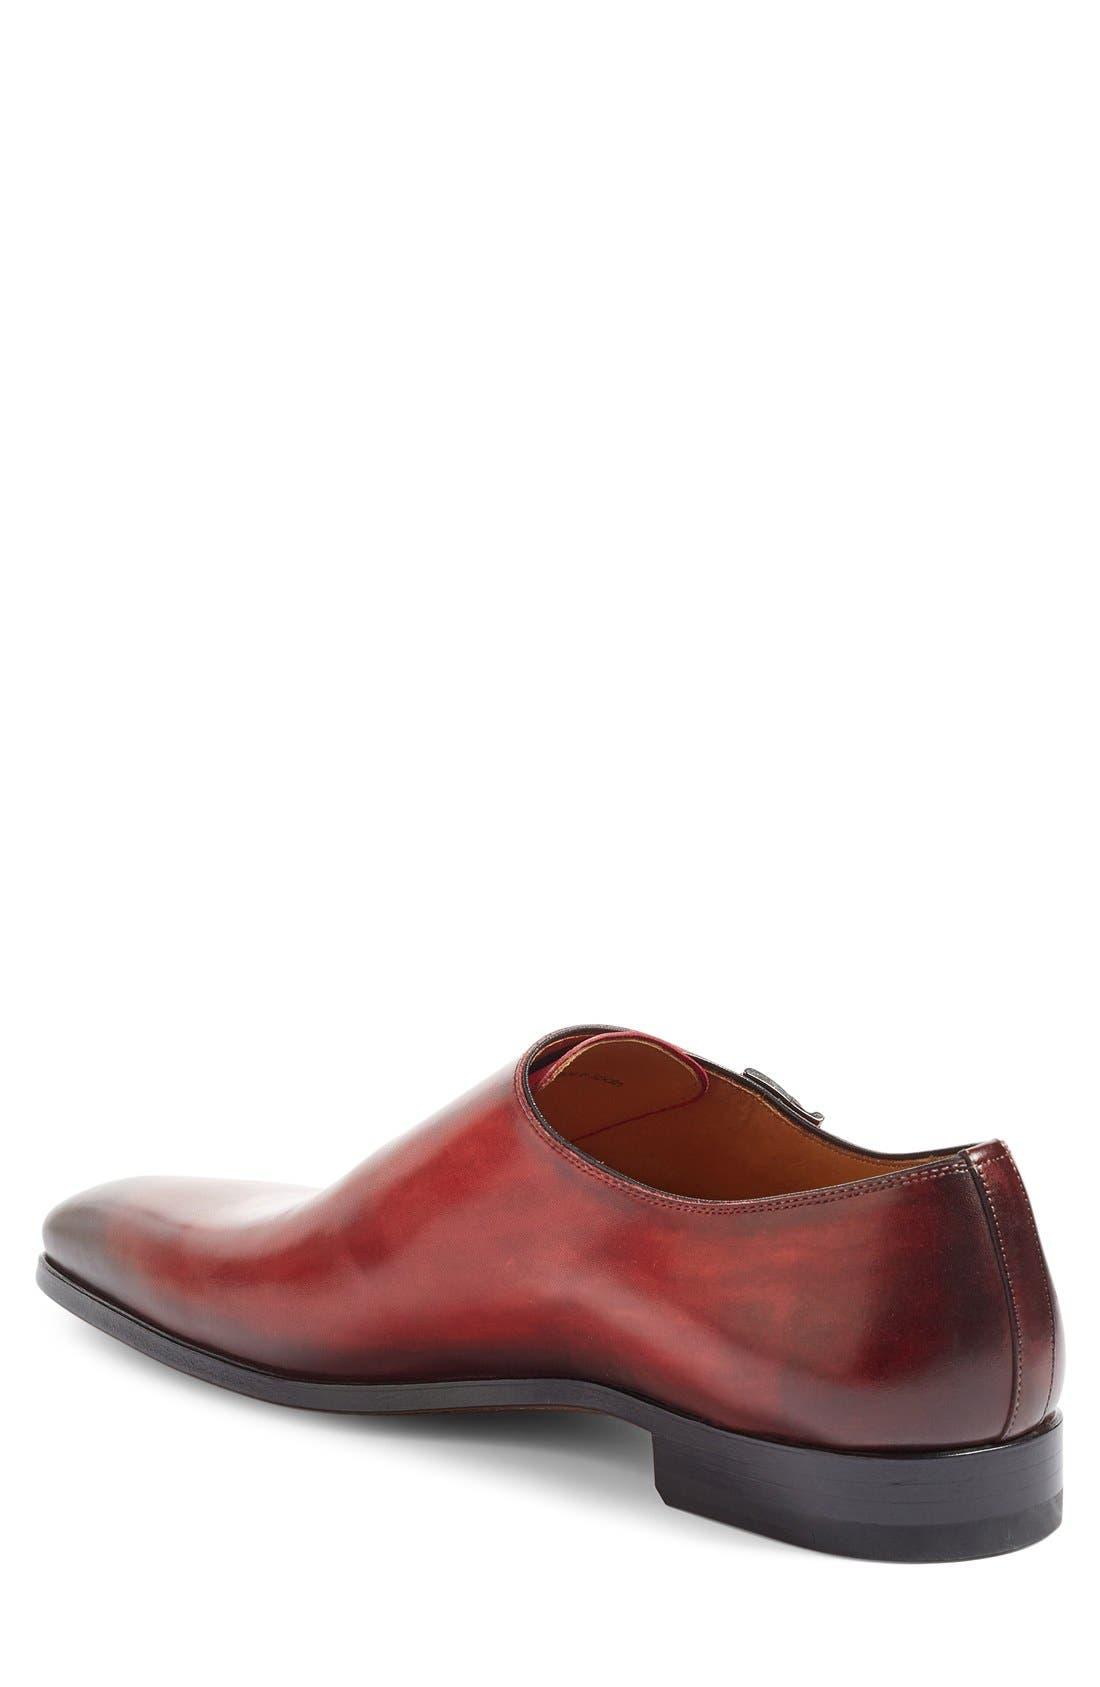 Jamin Double Monk Strap Shoe,                             Alternate thumbnail 6, color,